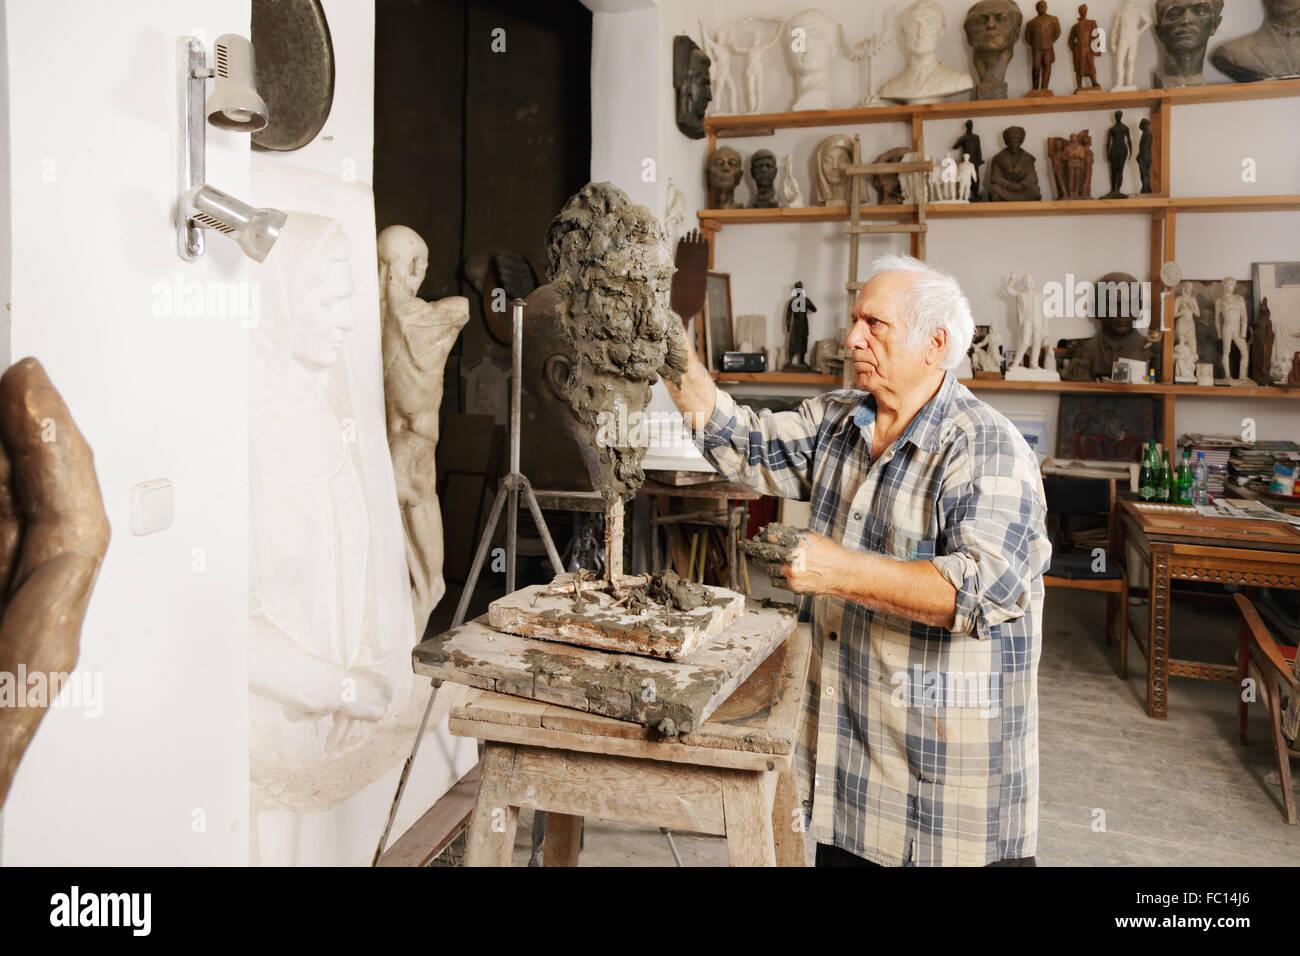 Sculptor creates head - Stock Image